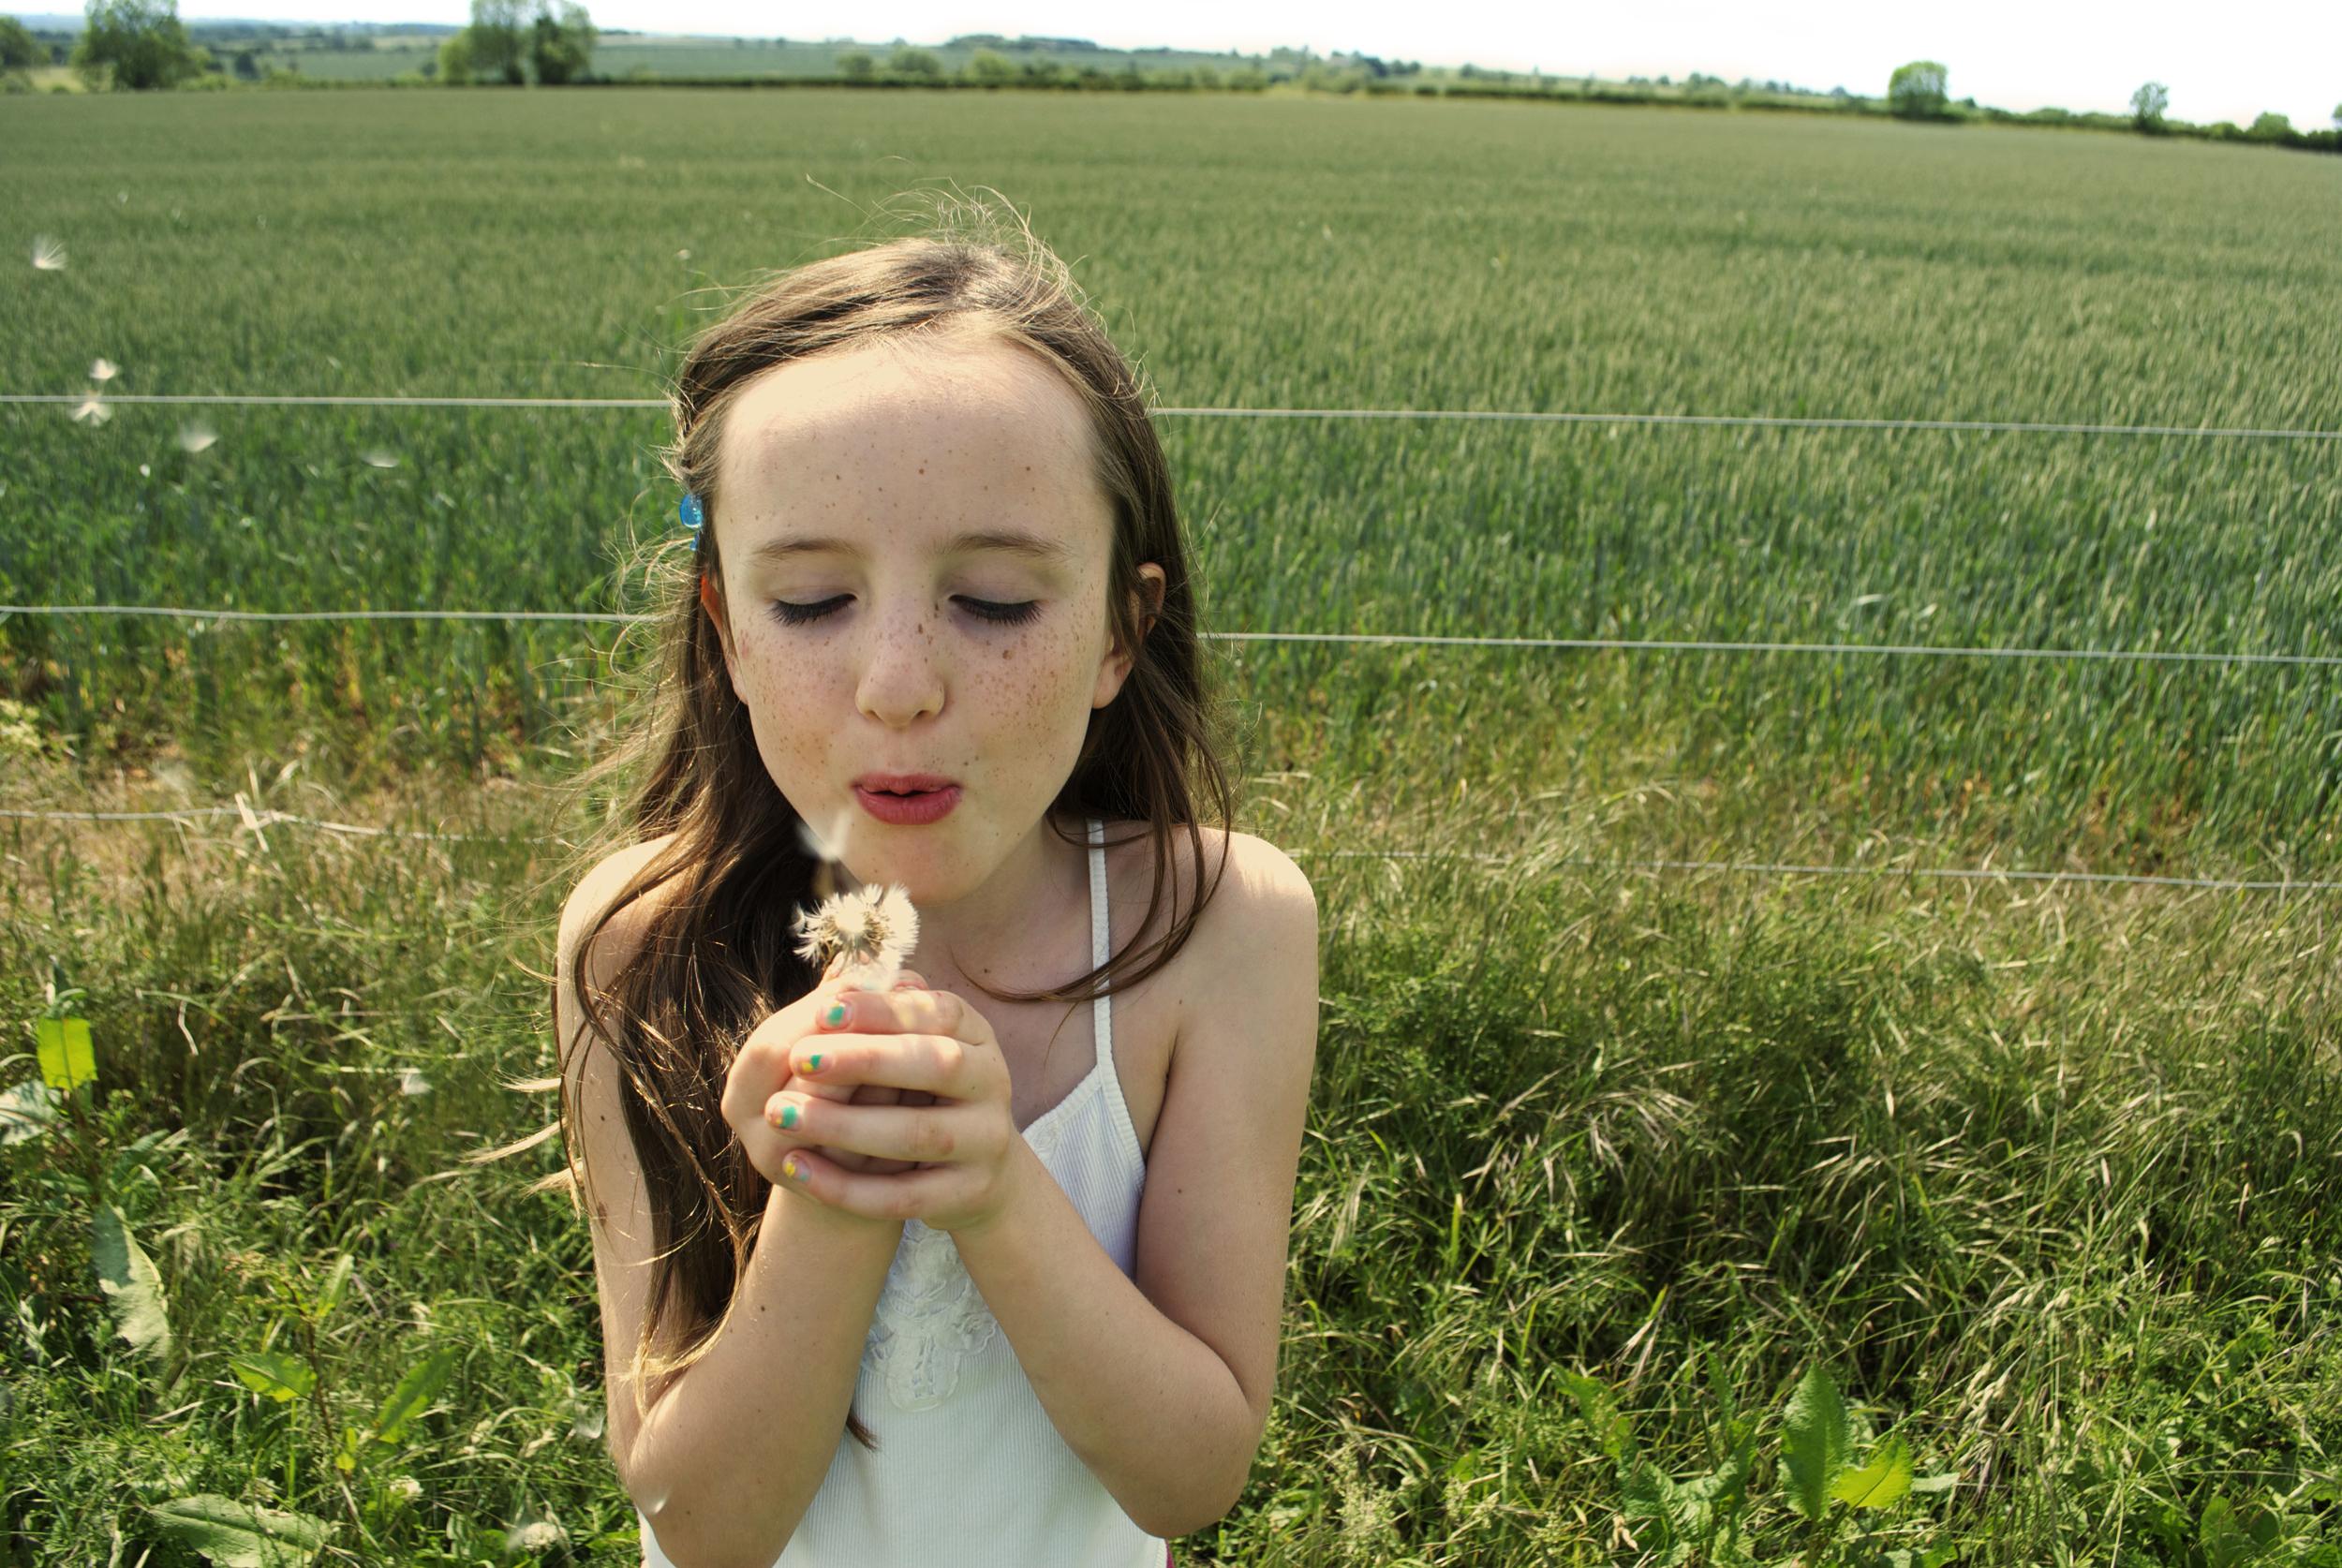 PORTRAITS | Girl with Dandelion, Oxfordshire, United Kingdom